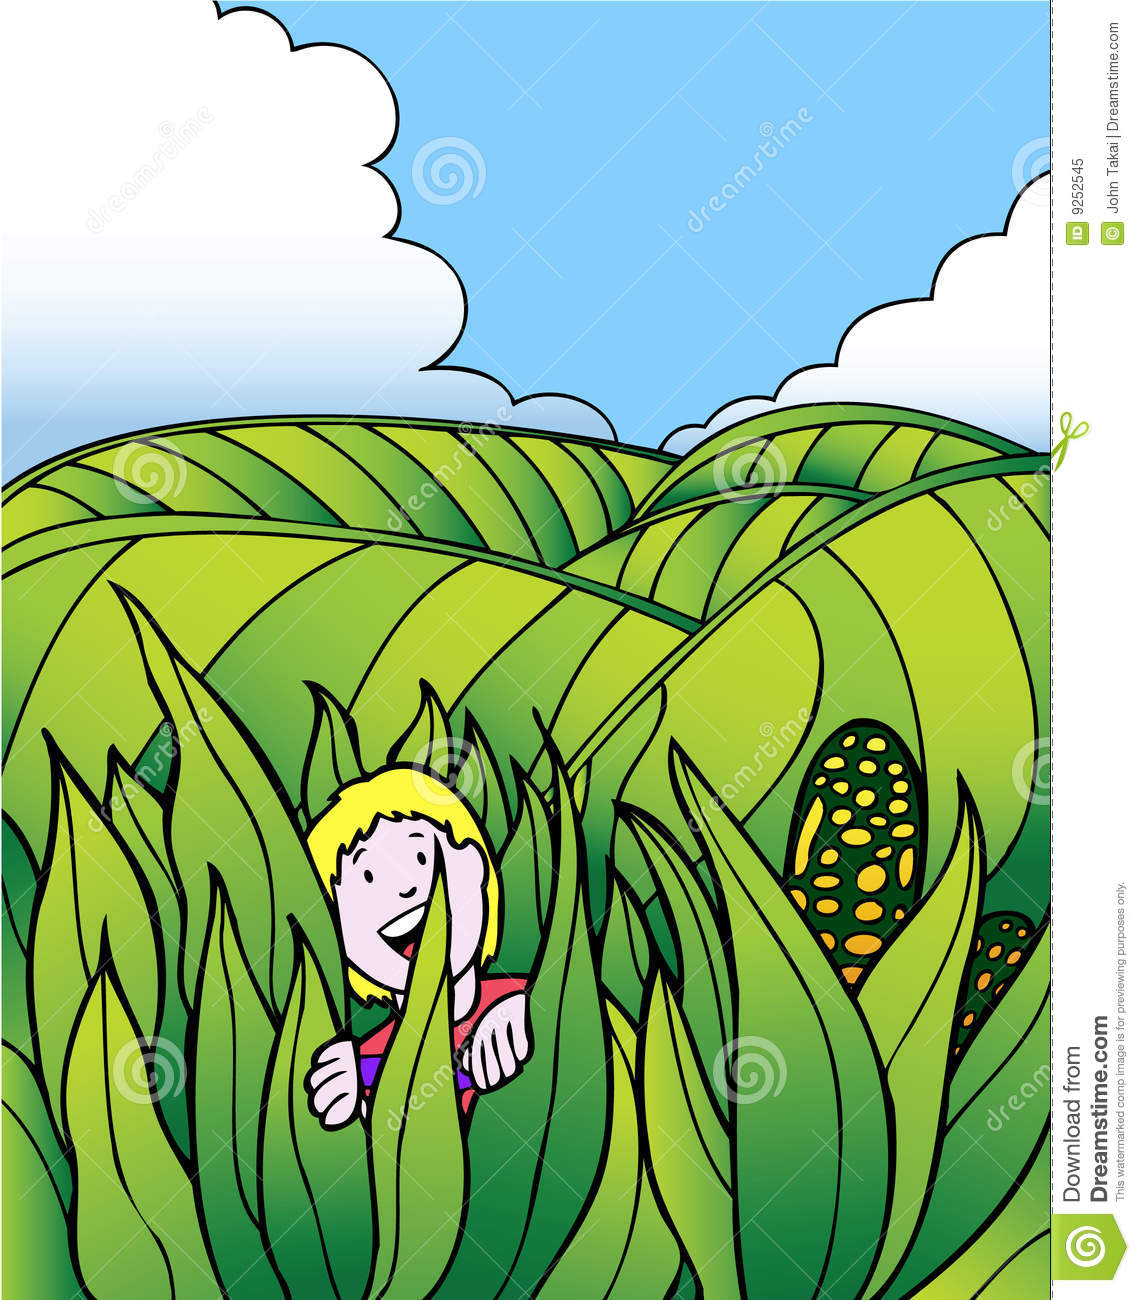 Feilds clipart corn field Child Fields Field Adventure Clipart